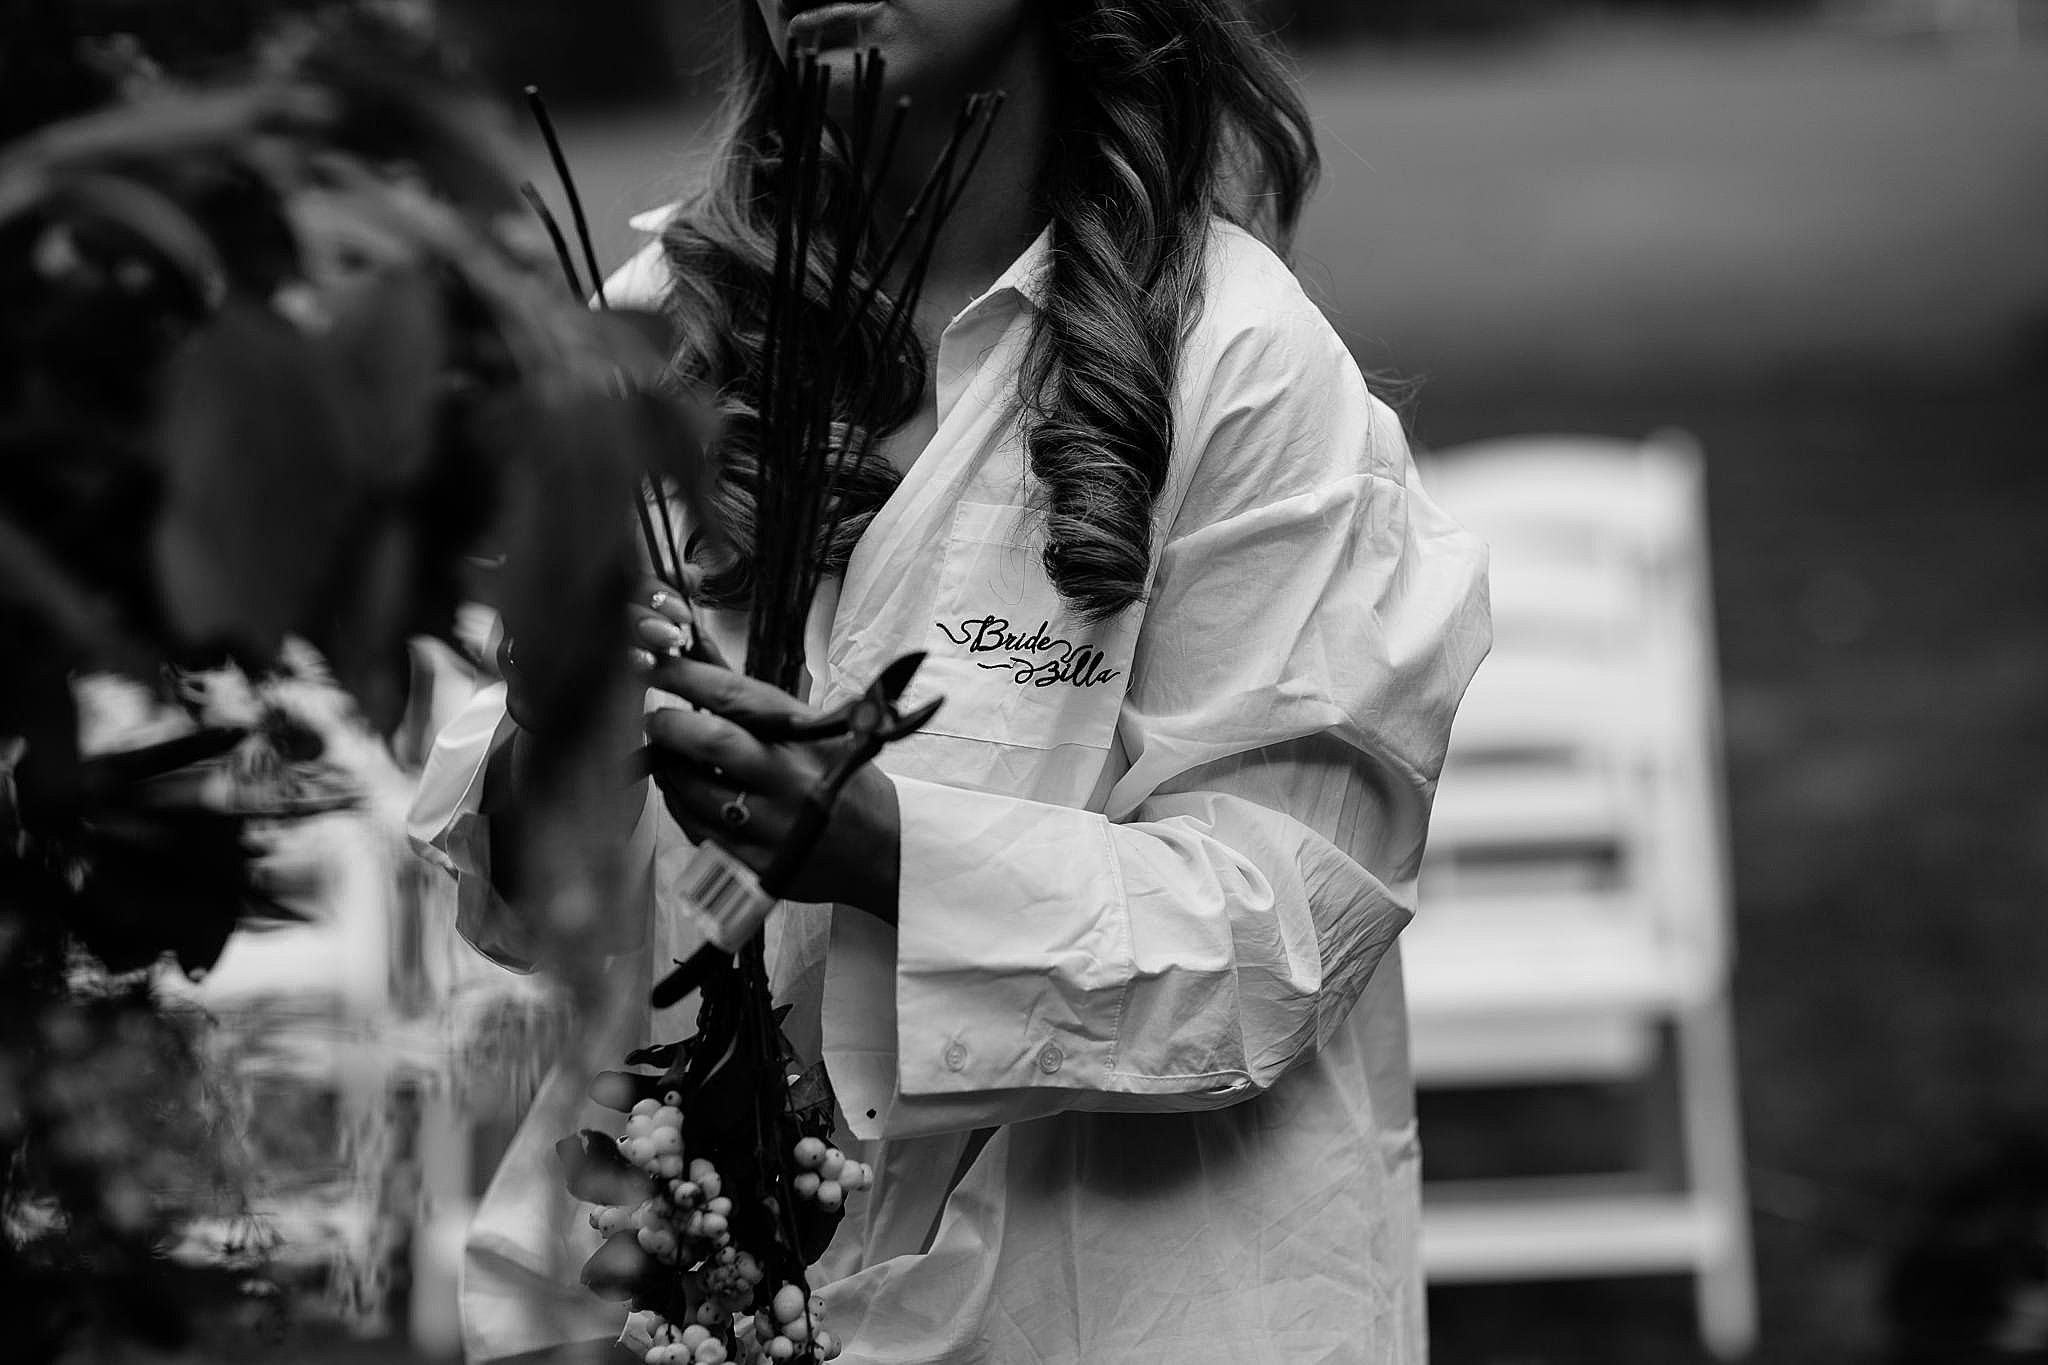 Keepsakephoto by the Keeffes,ACT wedding photographer,ACT weddings,Bowral Wedding Photographer,Canberra Wedding Photographer,Canberra Wedding Photography,canberra weddings,Southern Highlands Wedding,Southern Highlands,Moxom & Whitney,Canberra Photography,country wedding,